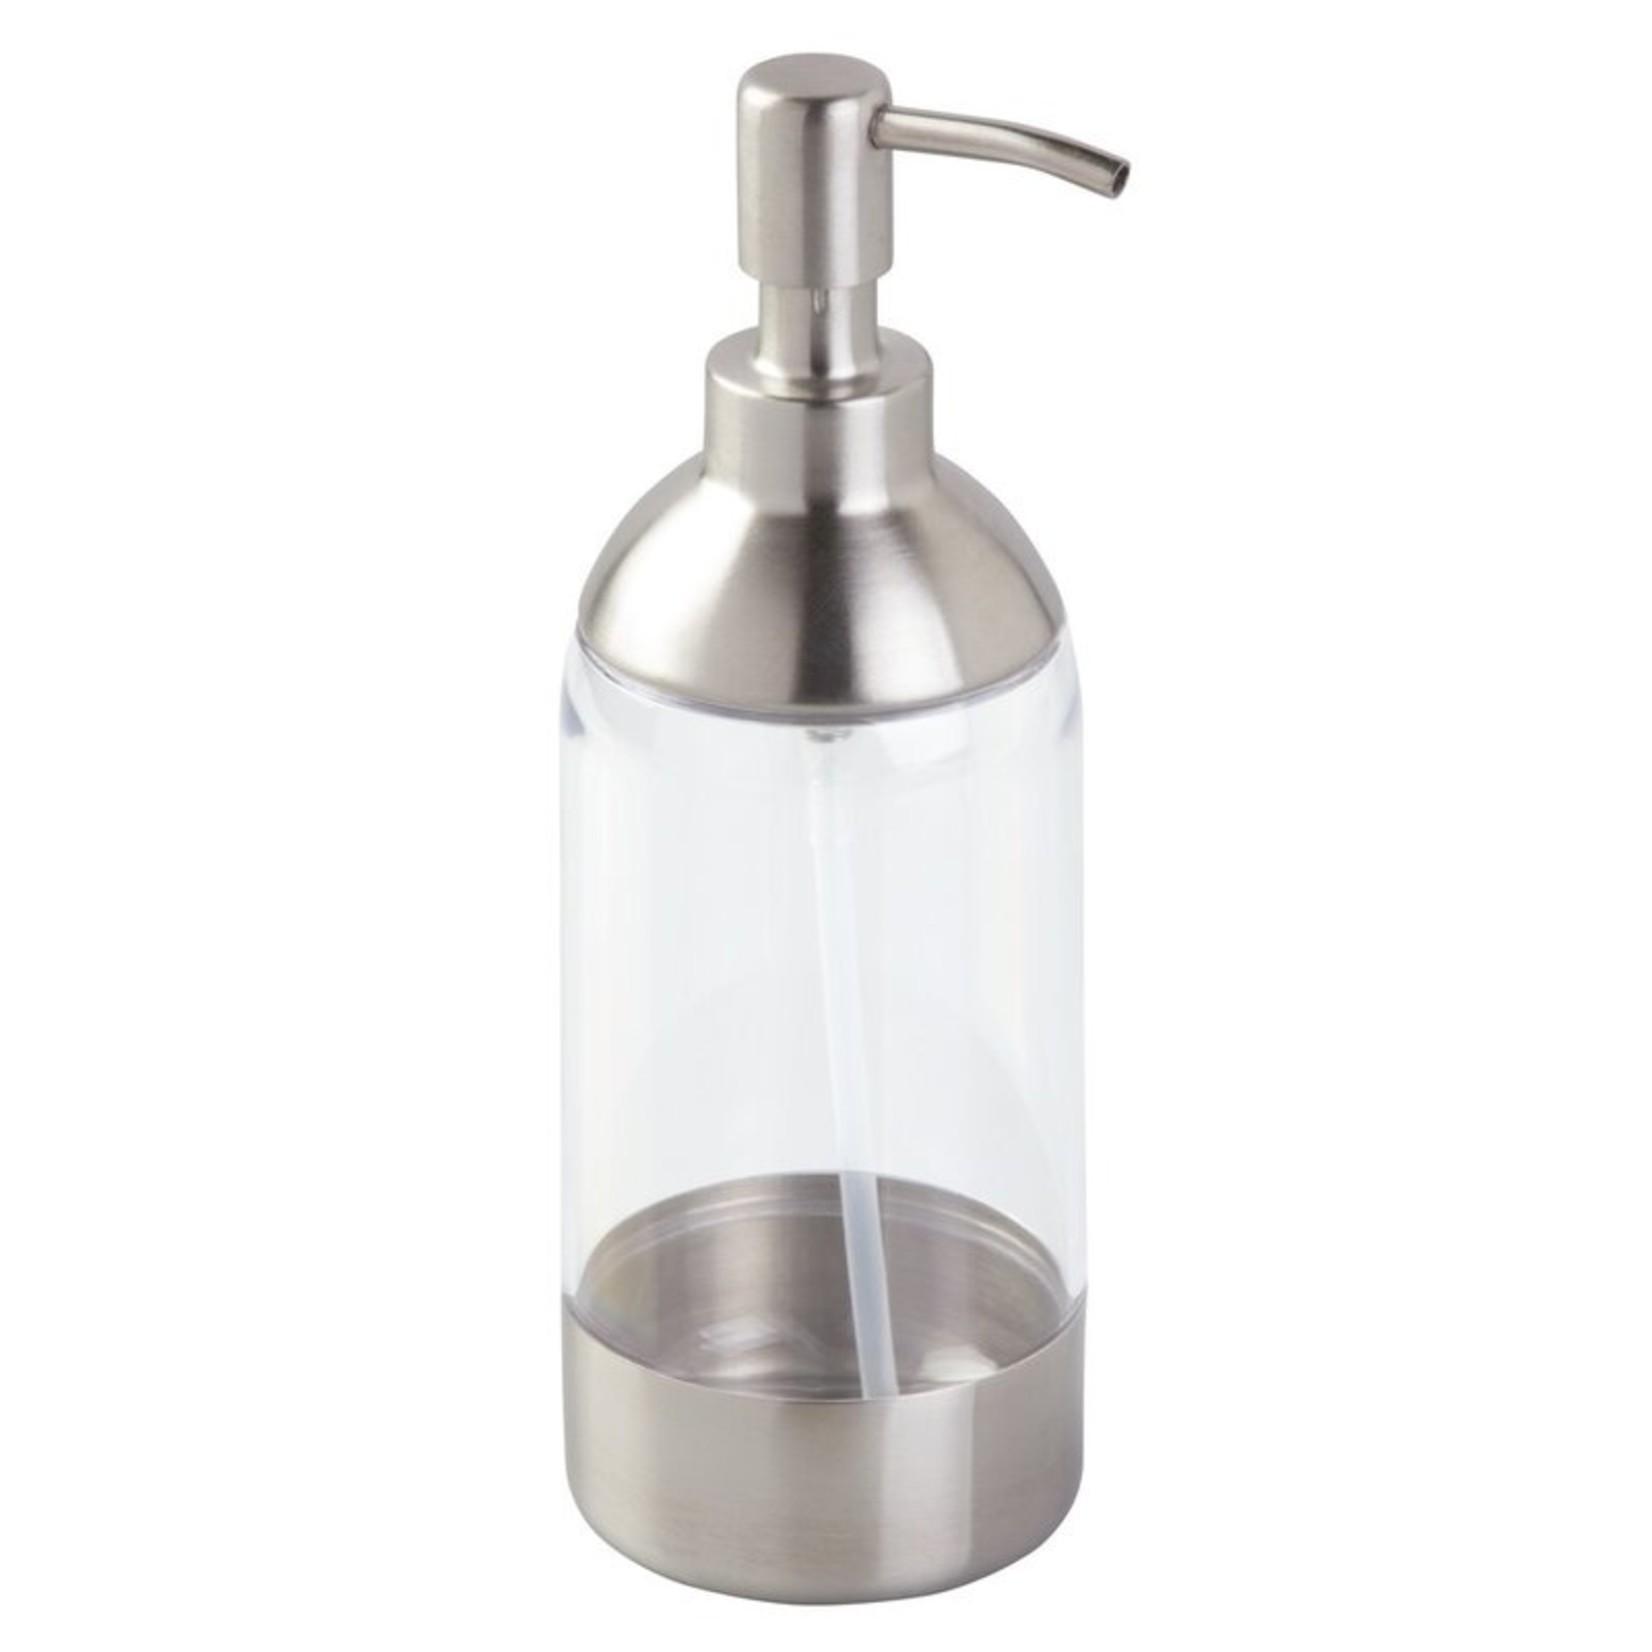 *Jorgensen Anna Pump Soap & Lotion Dispenser